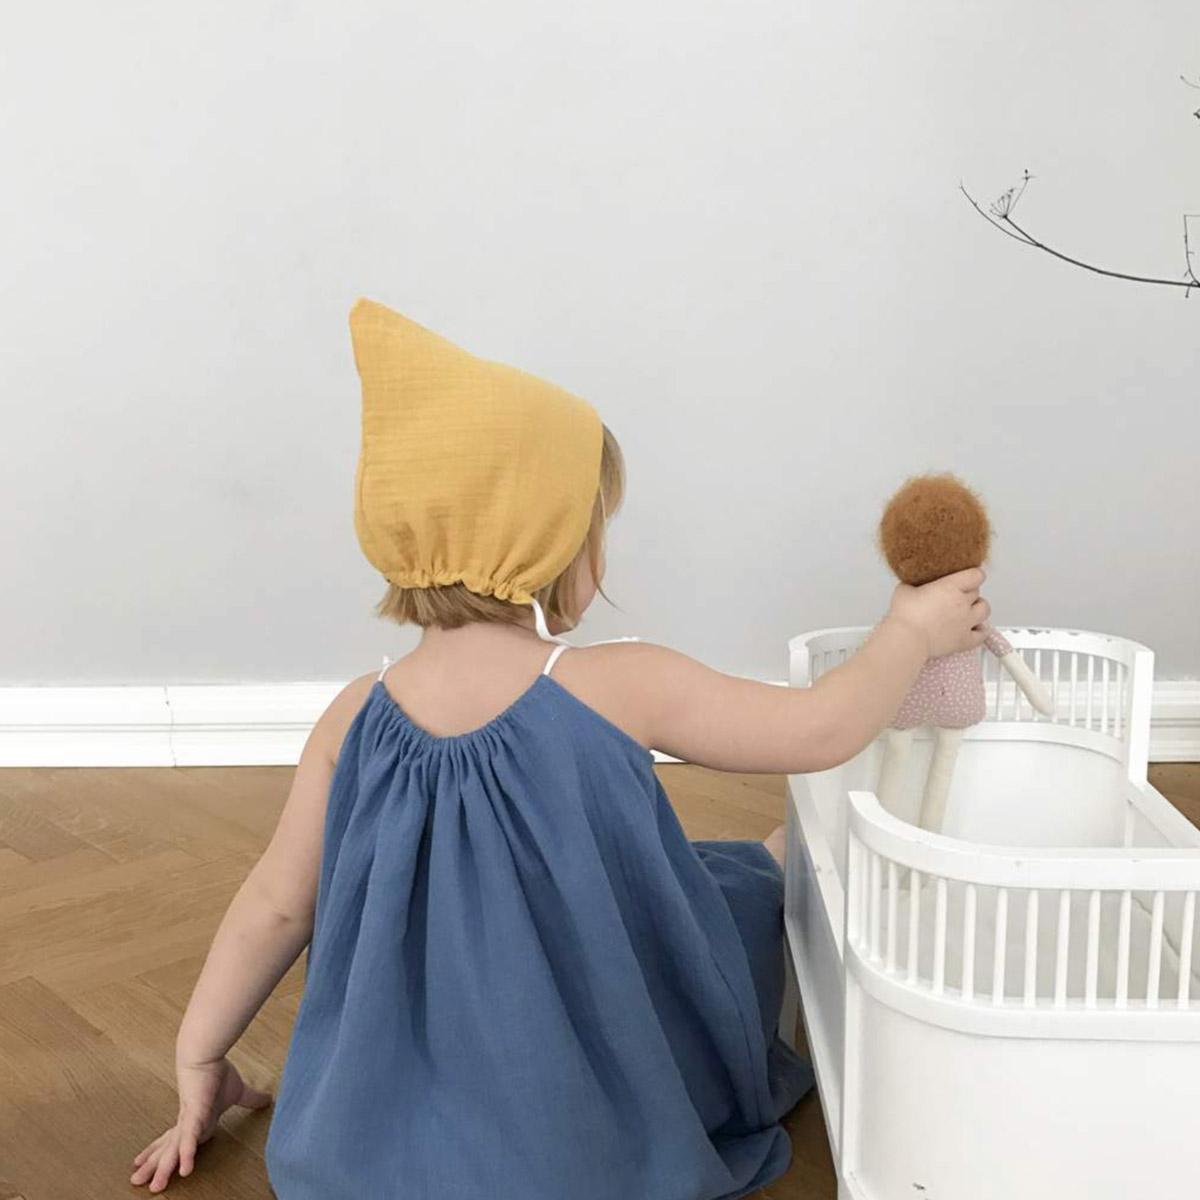 [60%OFF] ドイツから liilu pixie bonnet オーガニックコットン  [※1 クリックポスト可] mustard